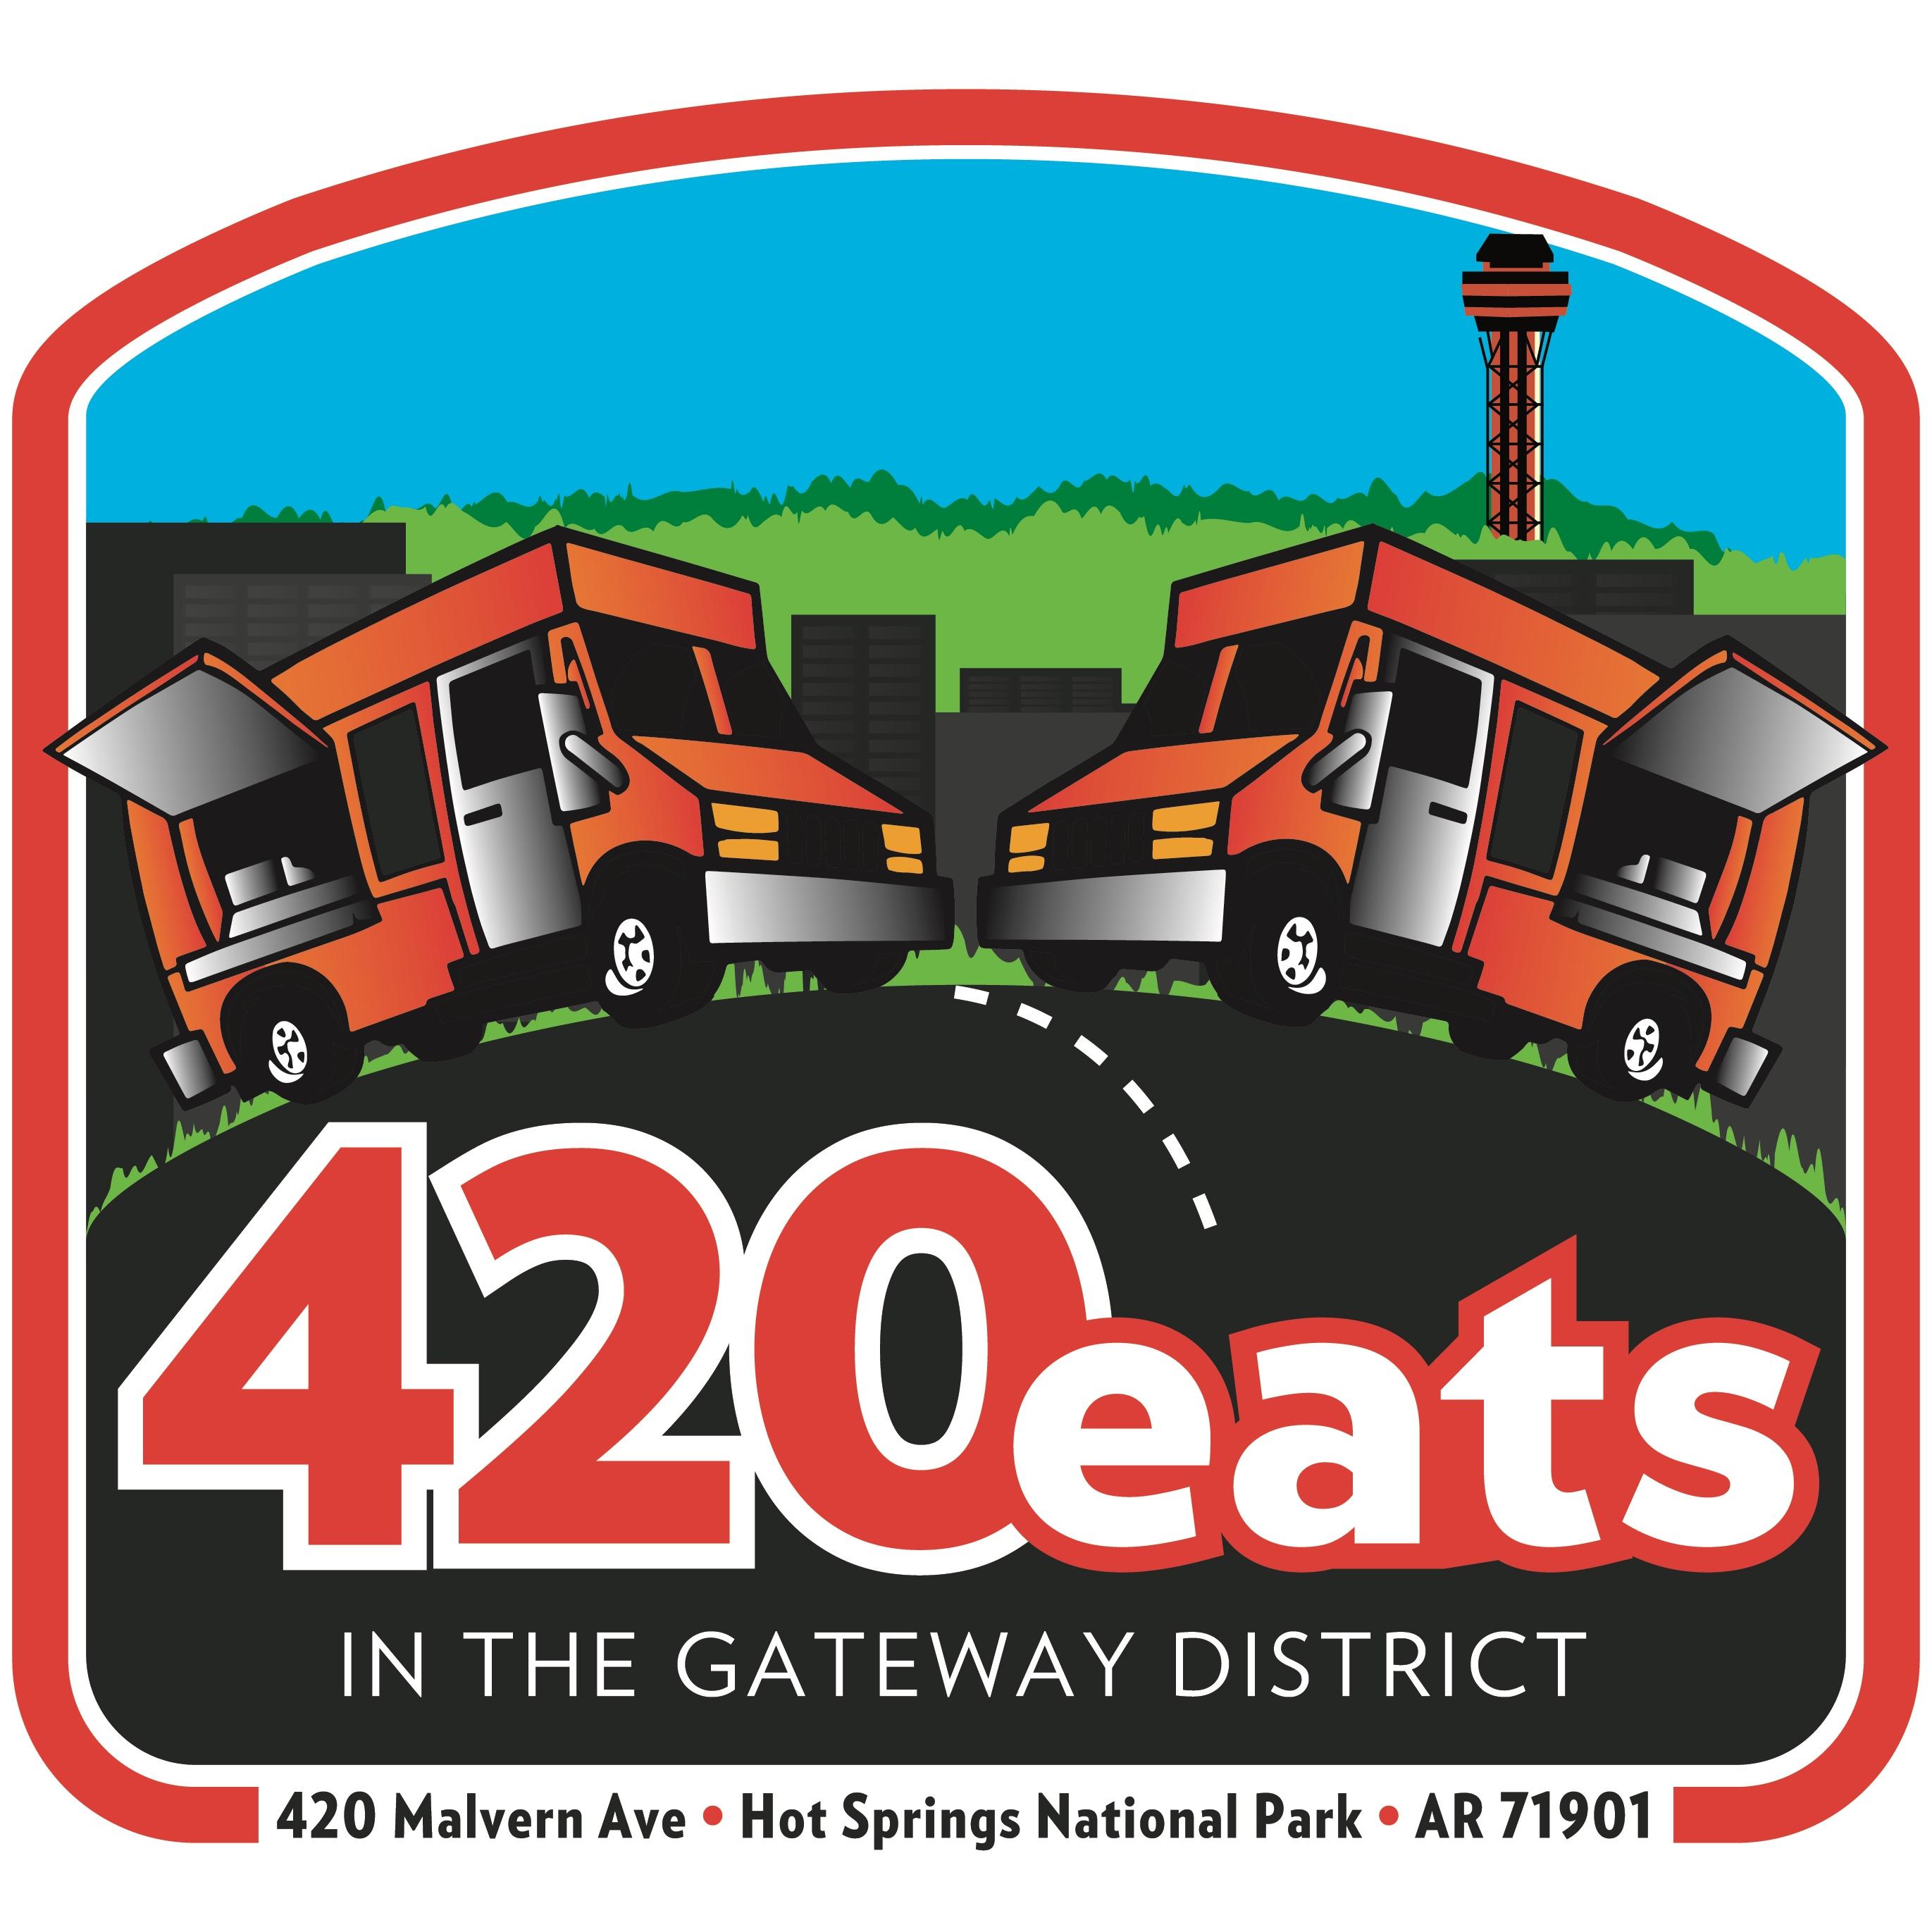 420eats Food Truck Court food truck profile image